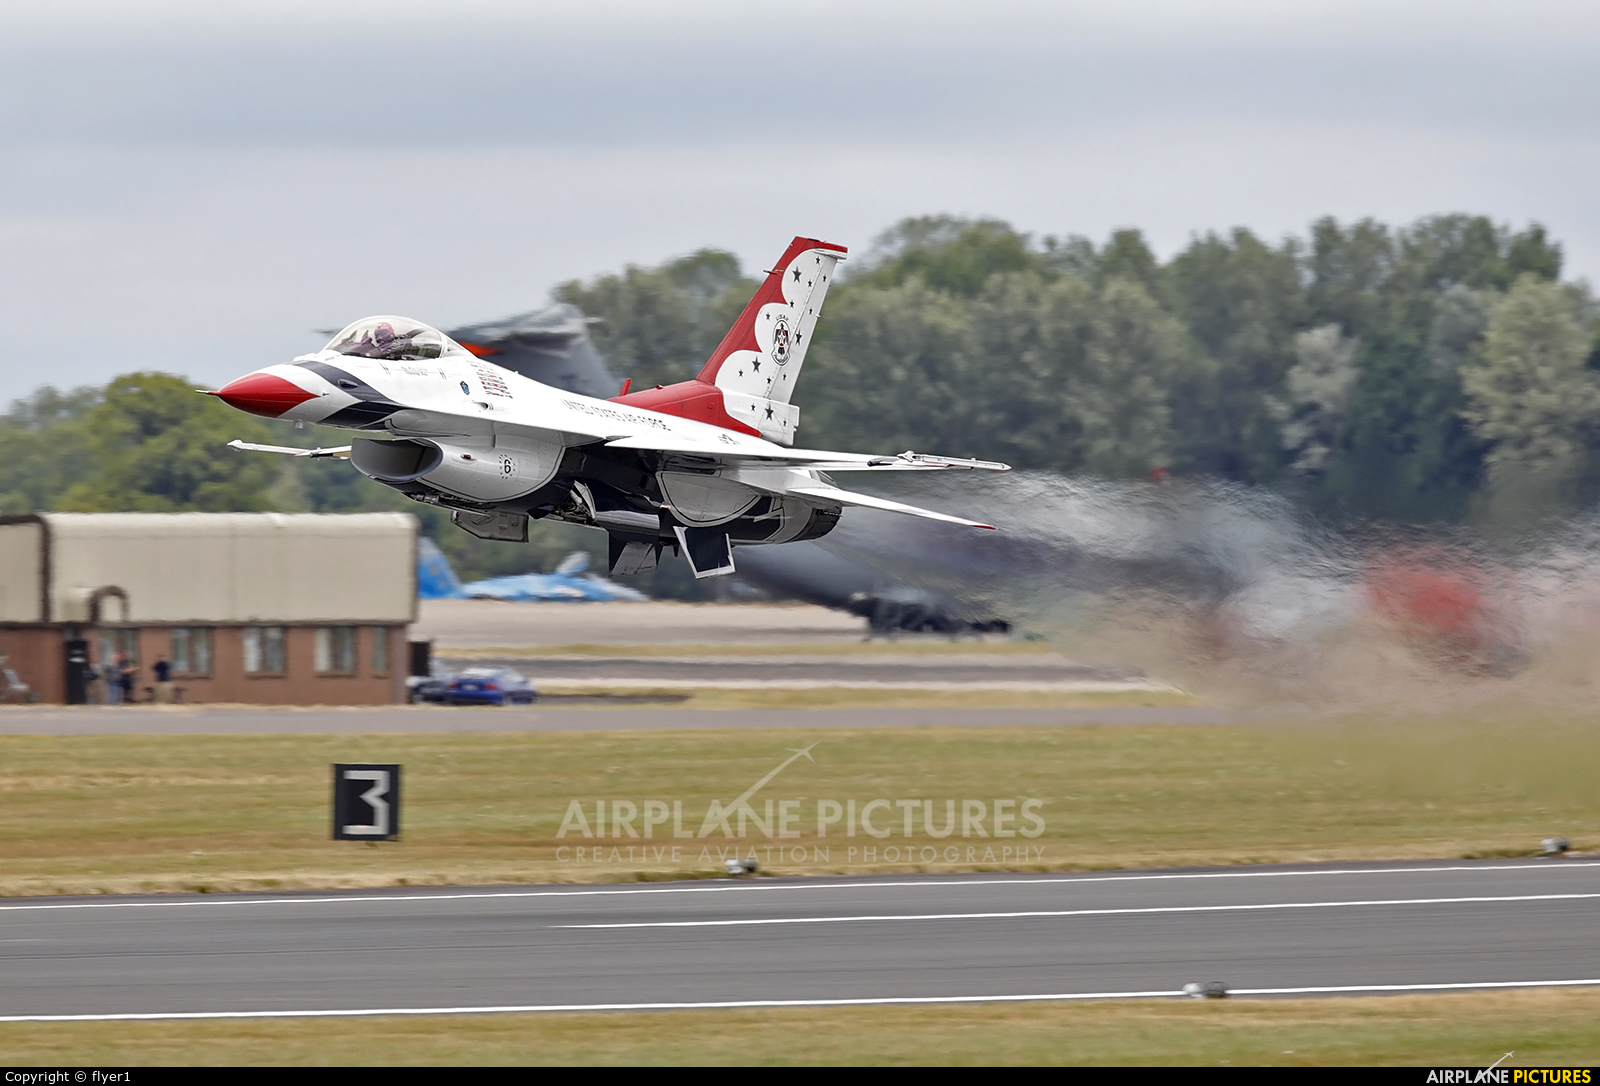 USA - Air Force : Thunderbirds 92-3908 aircraft at Fairford